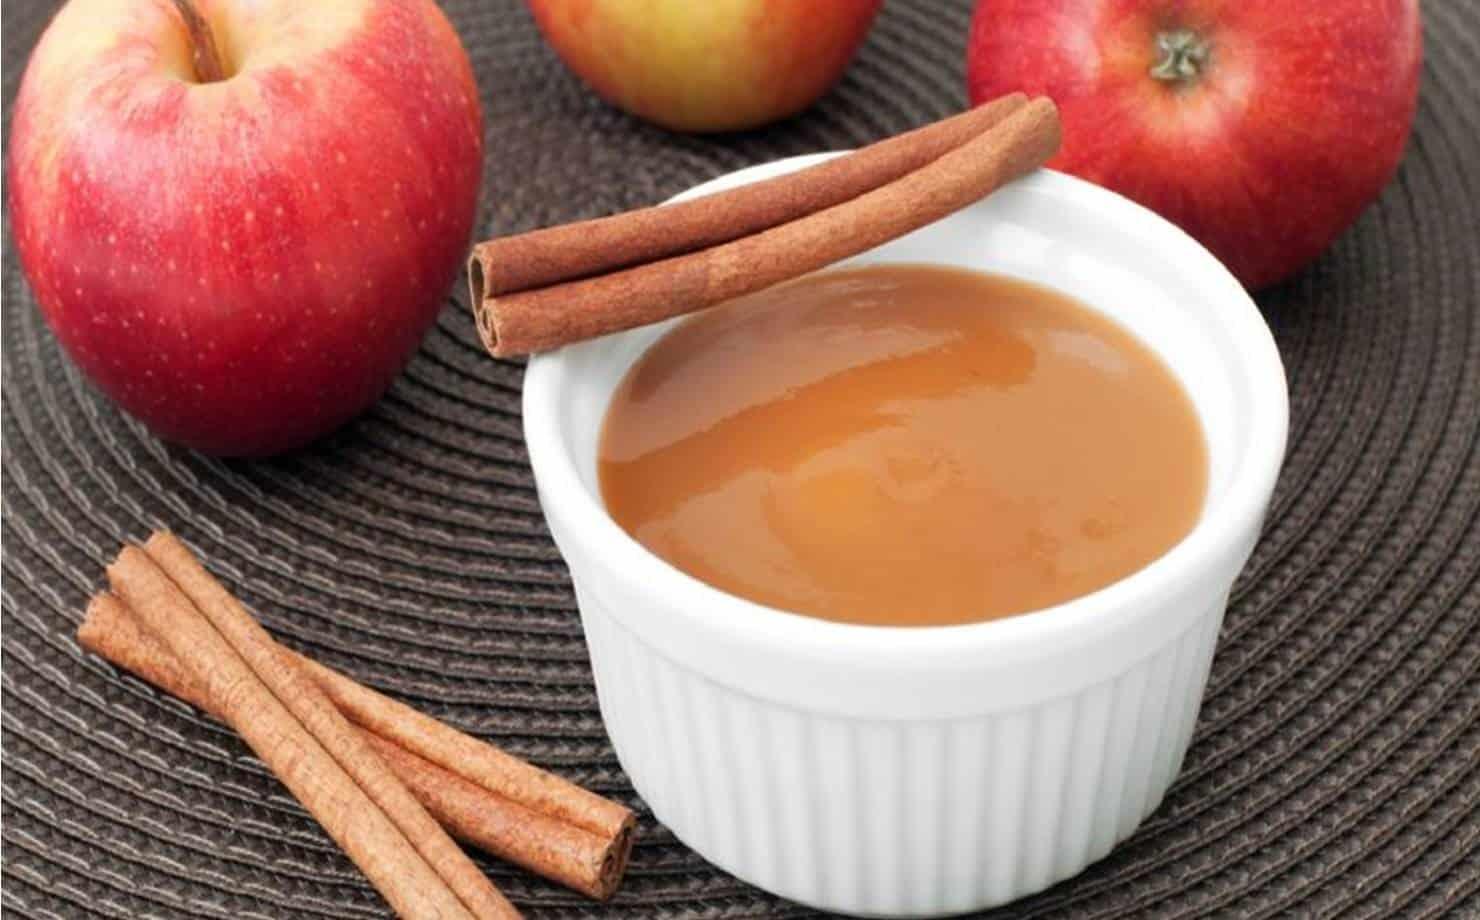 Molho de maçã exposto na mesa